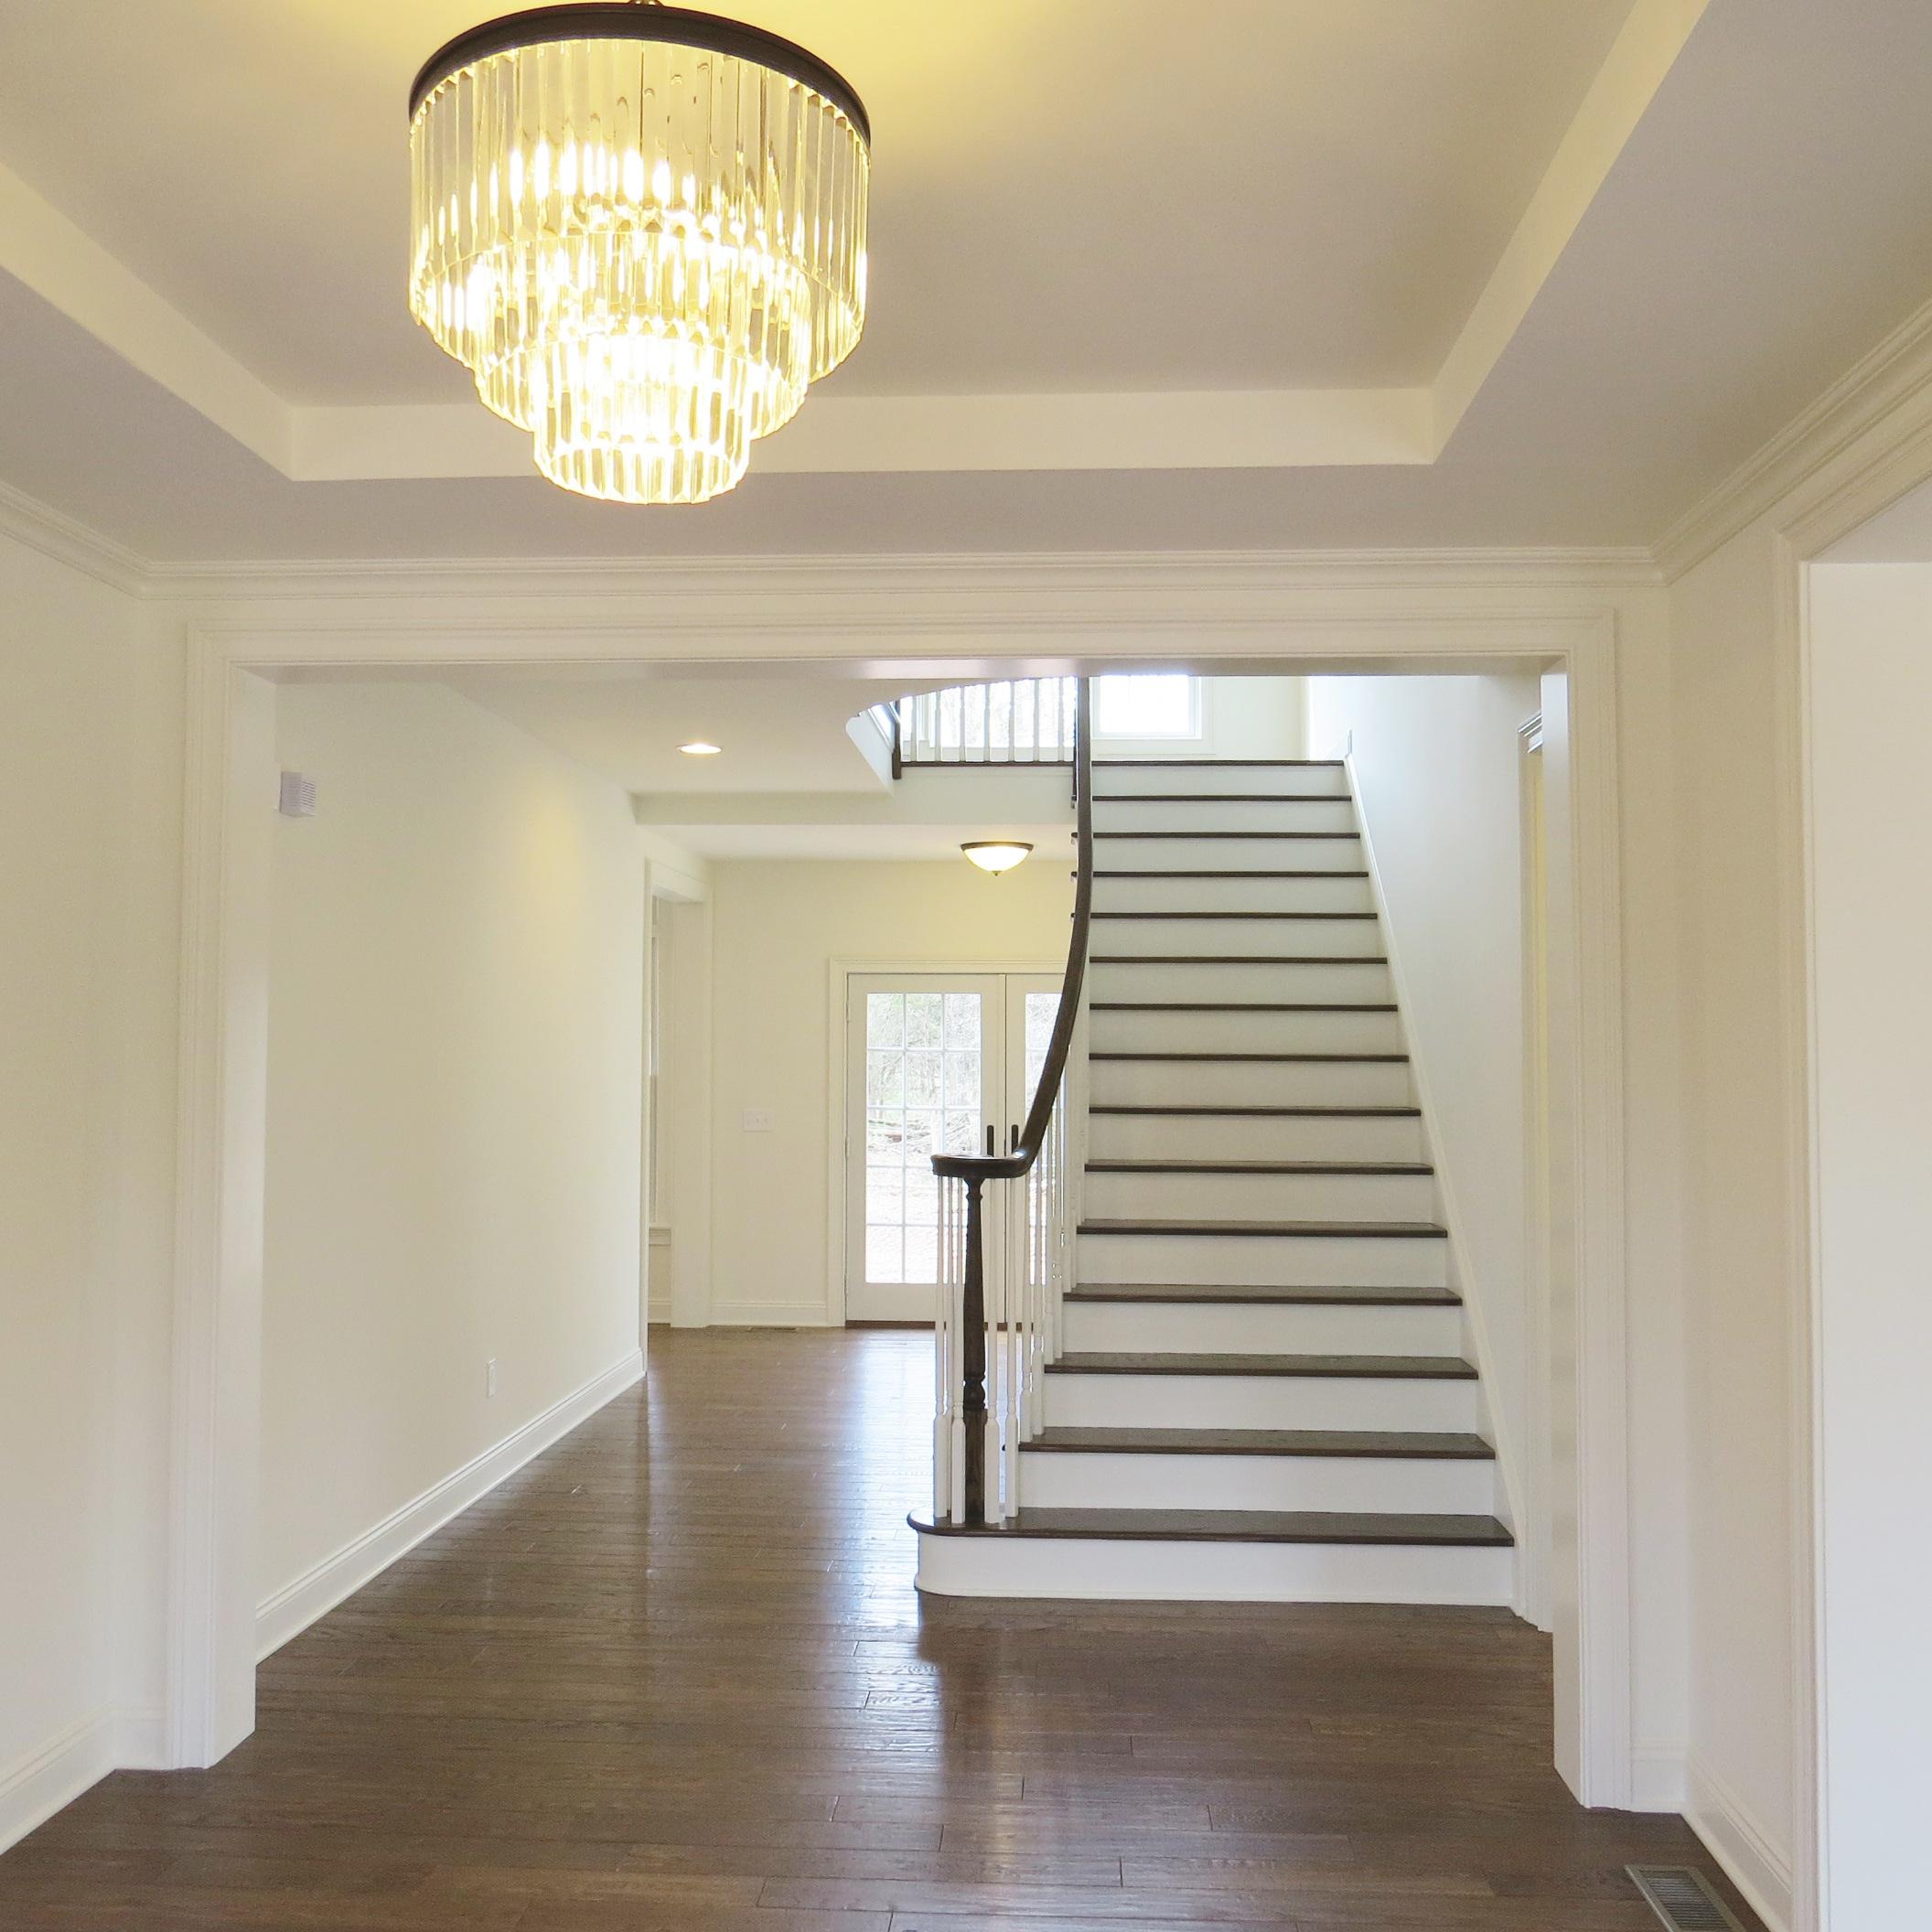 New Jersey Home Design Studio: Stairs